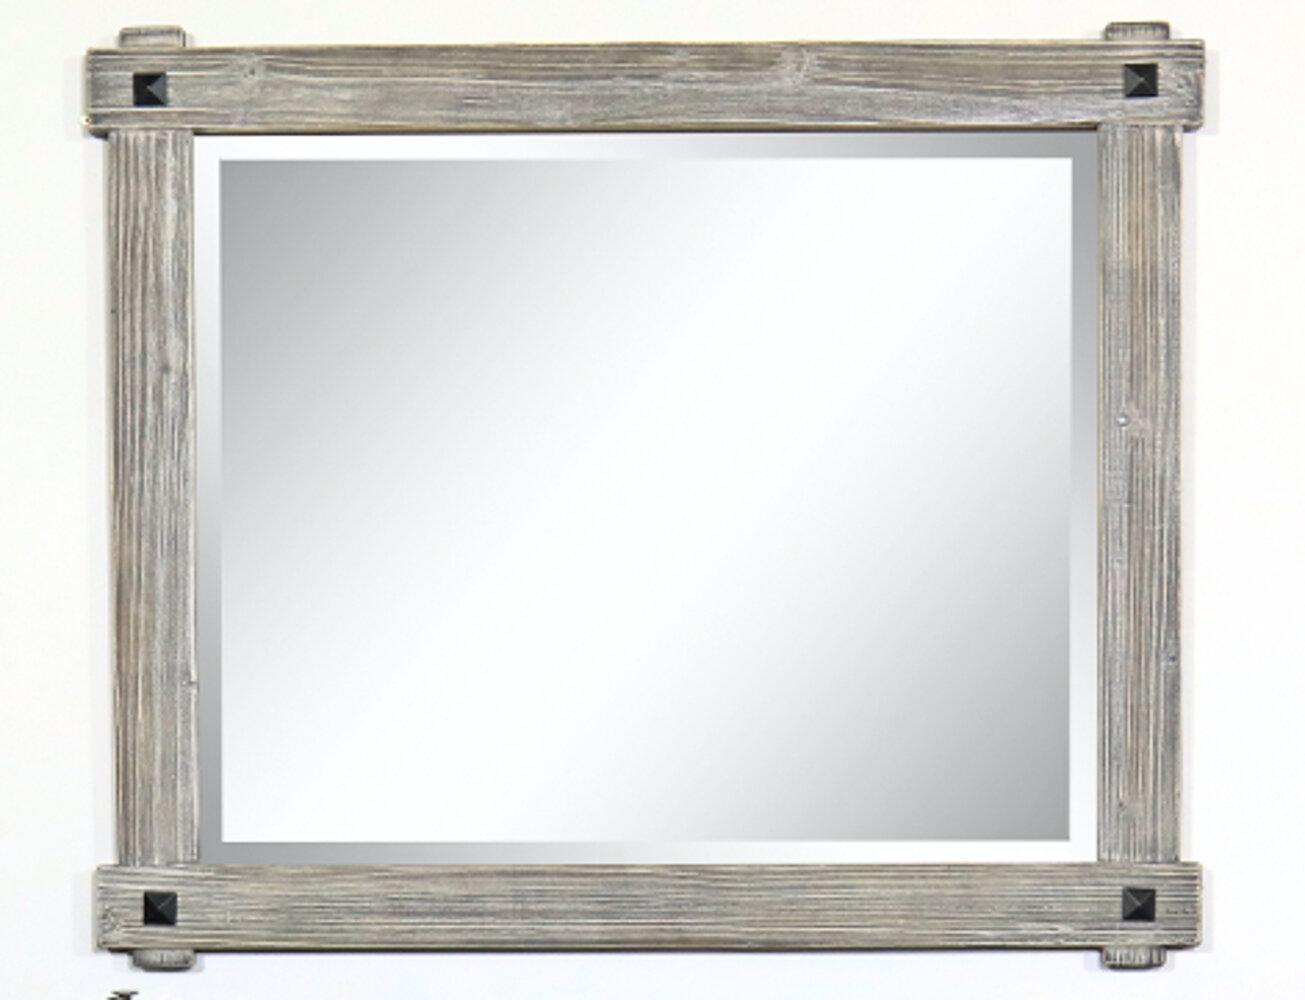 Millwood Pines Longmeadow Rustic Wood Framed Bathroom